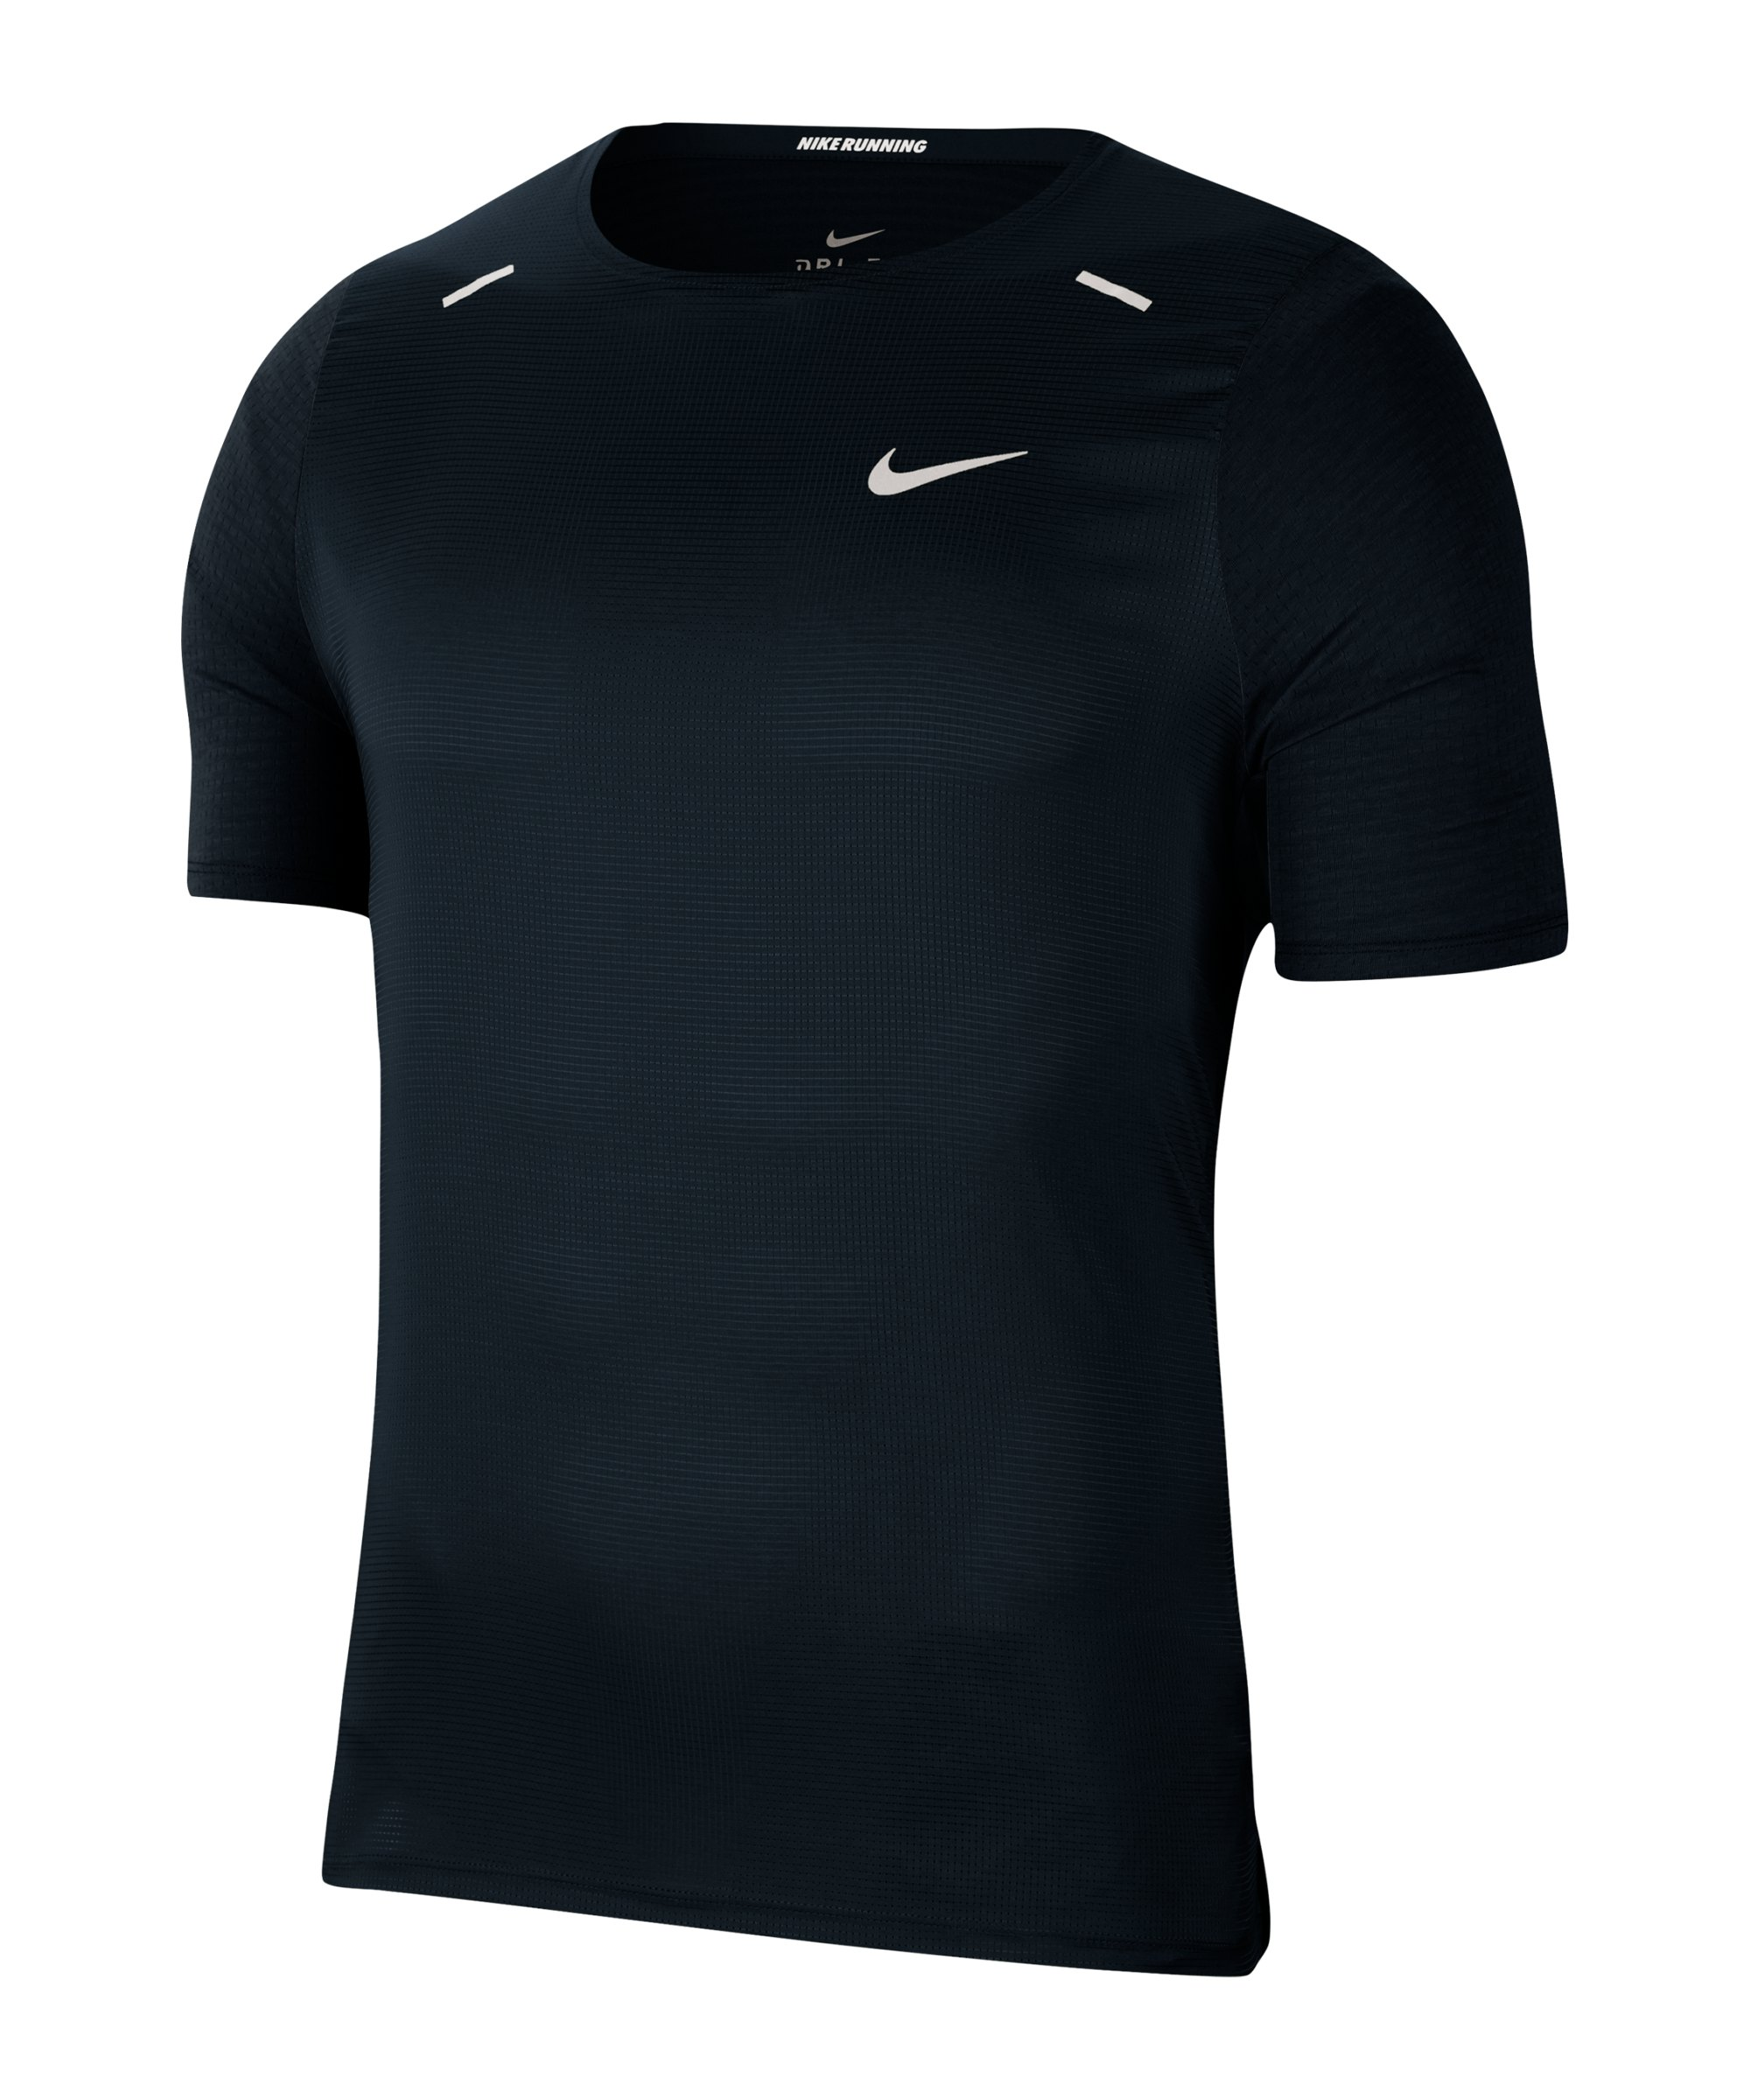 Nike Breathe Rise 365 T-Shirt Running Schwarz F010 - schwarz